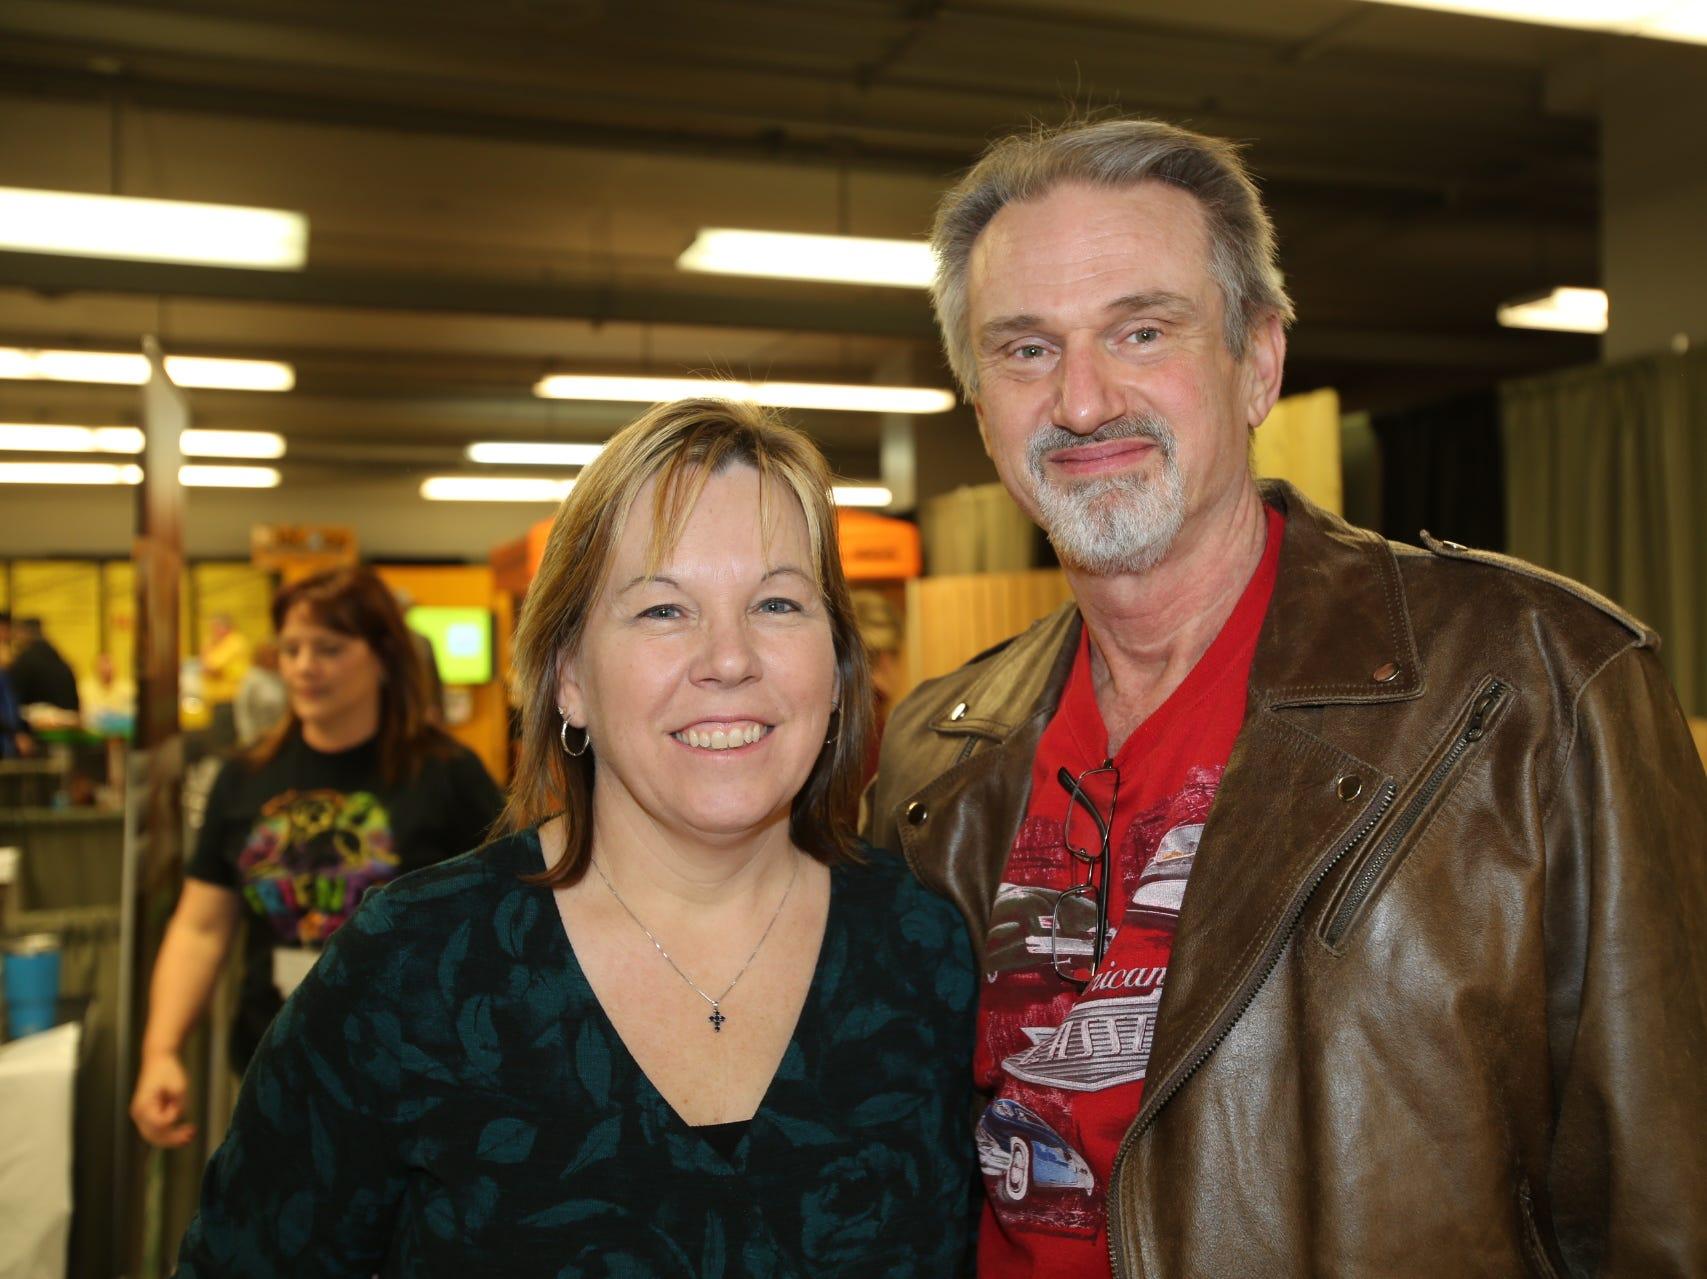 Cindy Robertson and John Herd